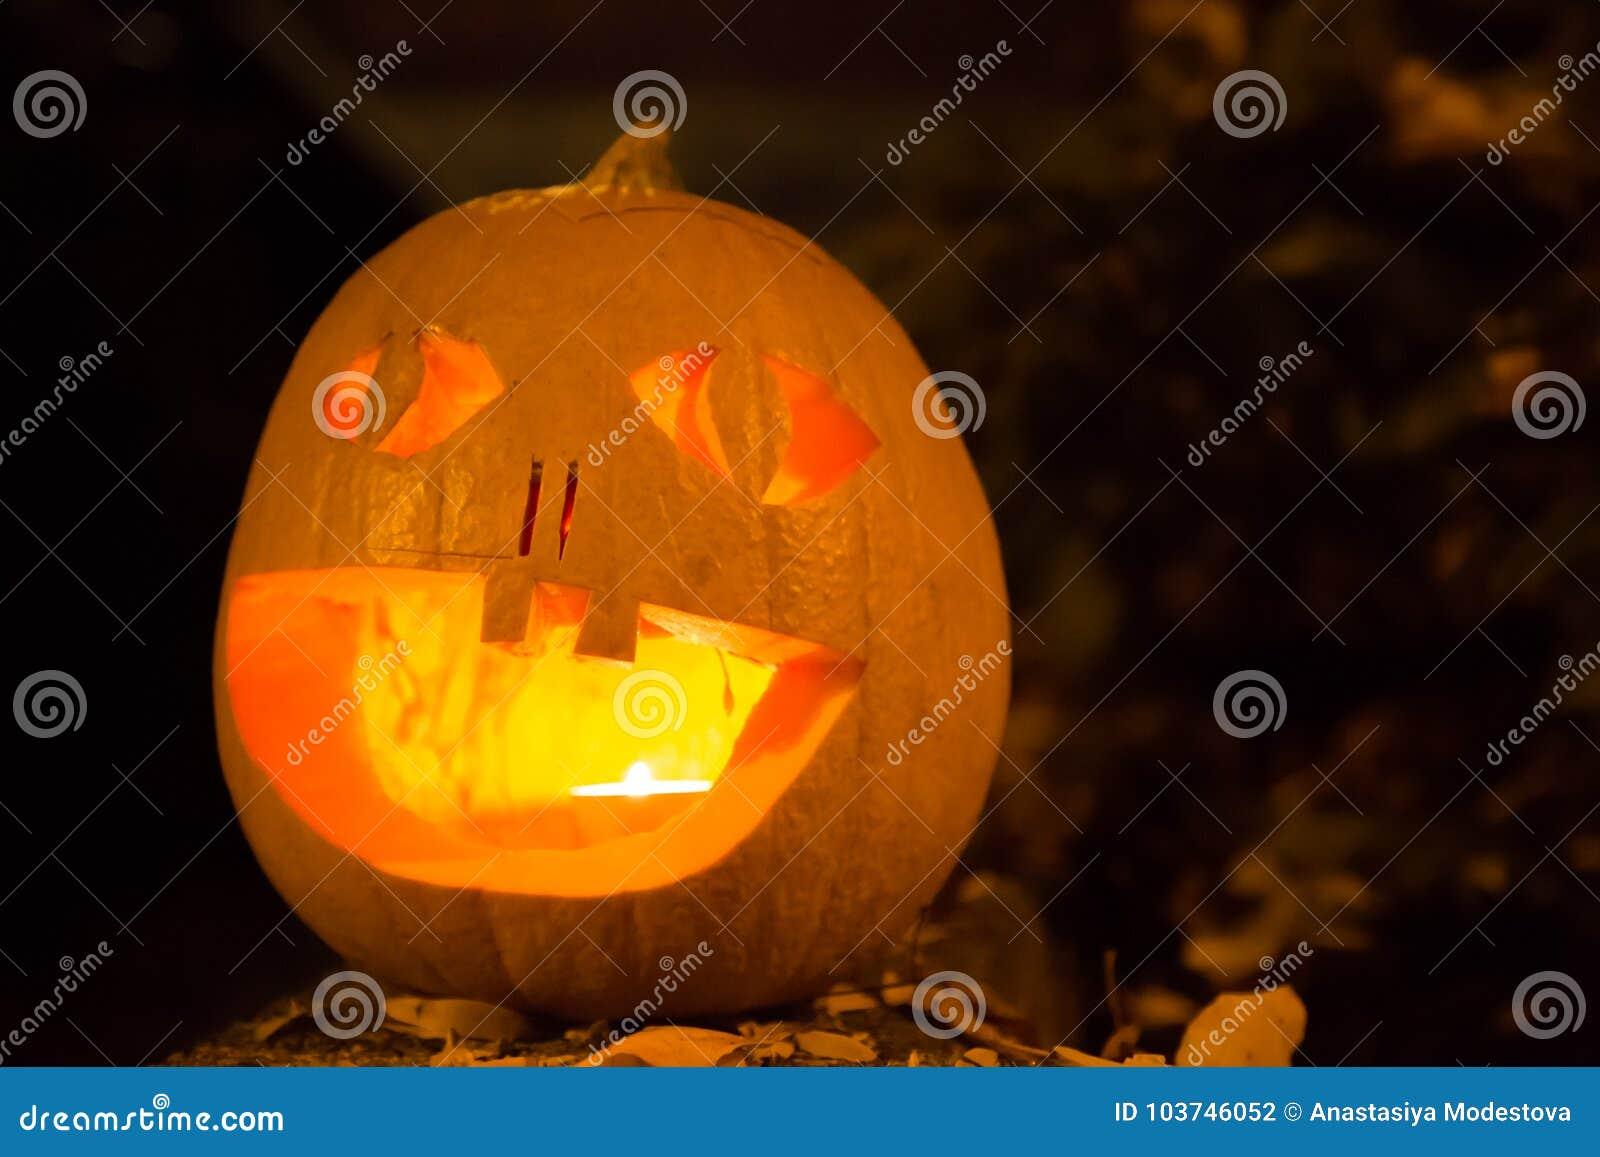 Carved halloween pumpkin spooky face dark background